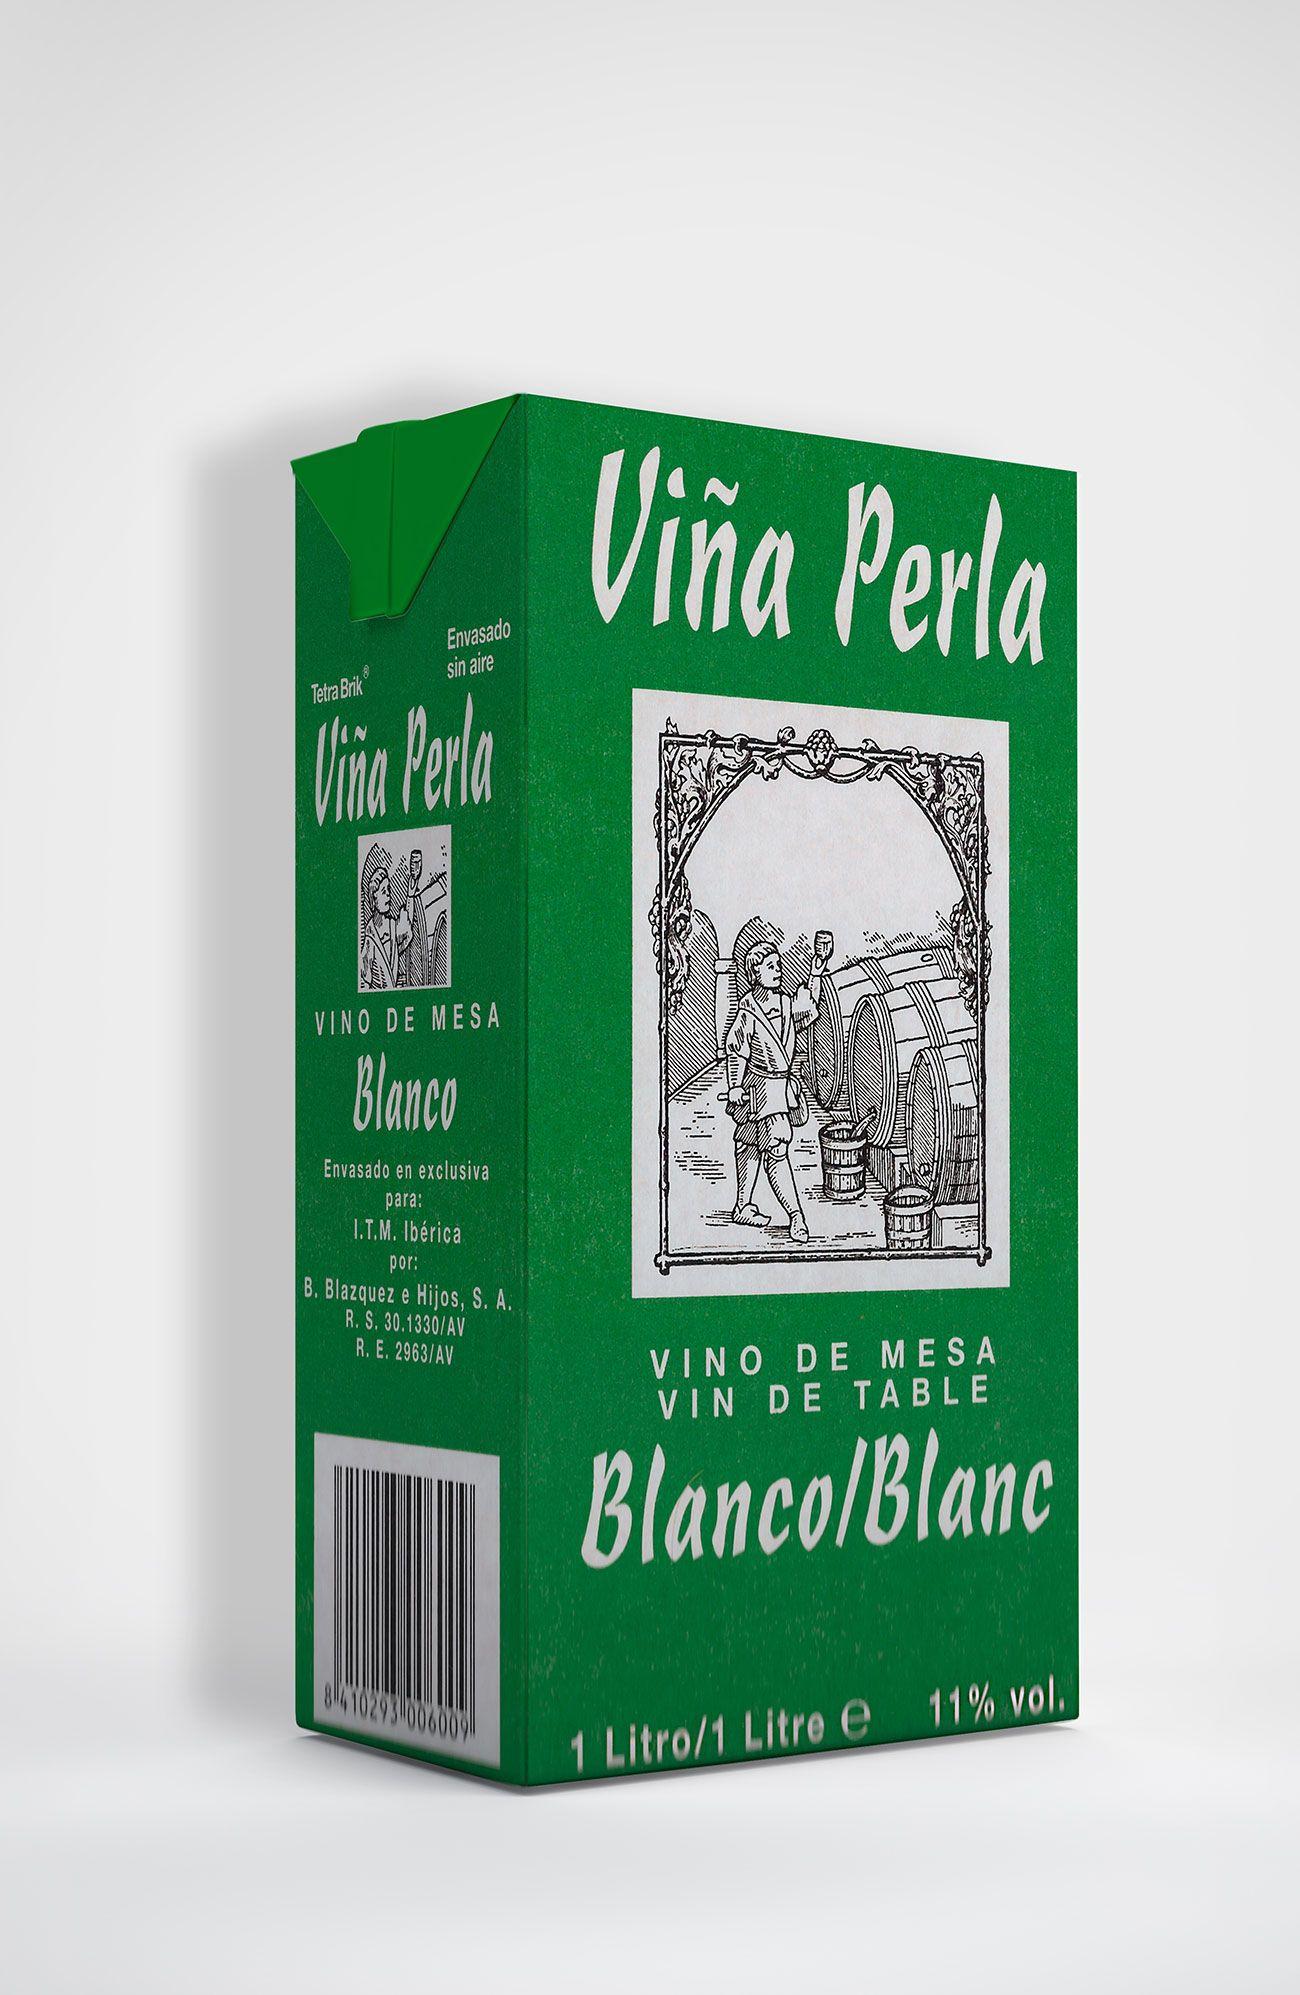 Benito Blázquez - Brik de Vino Blanco Viña Perla